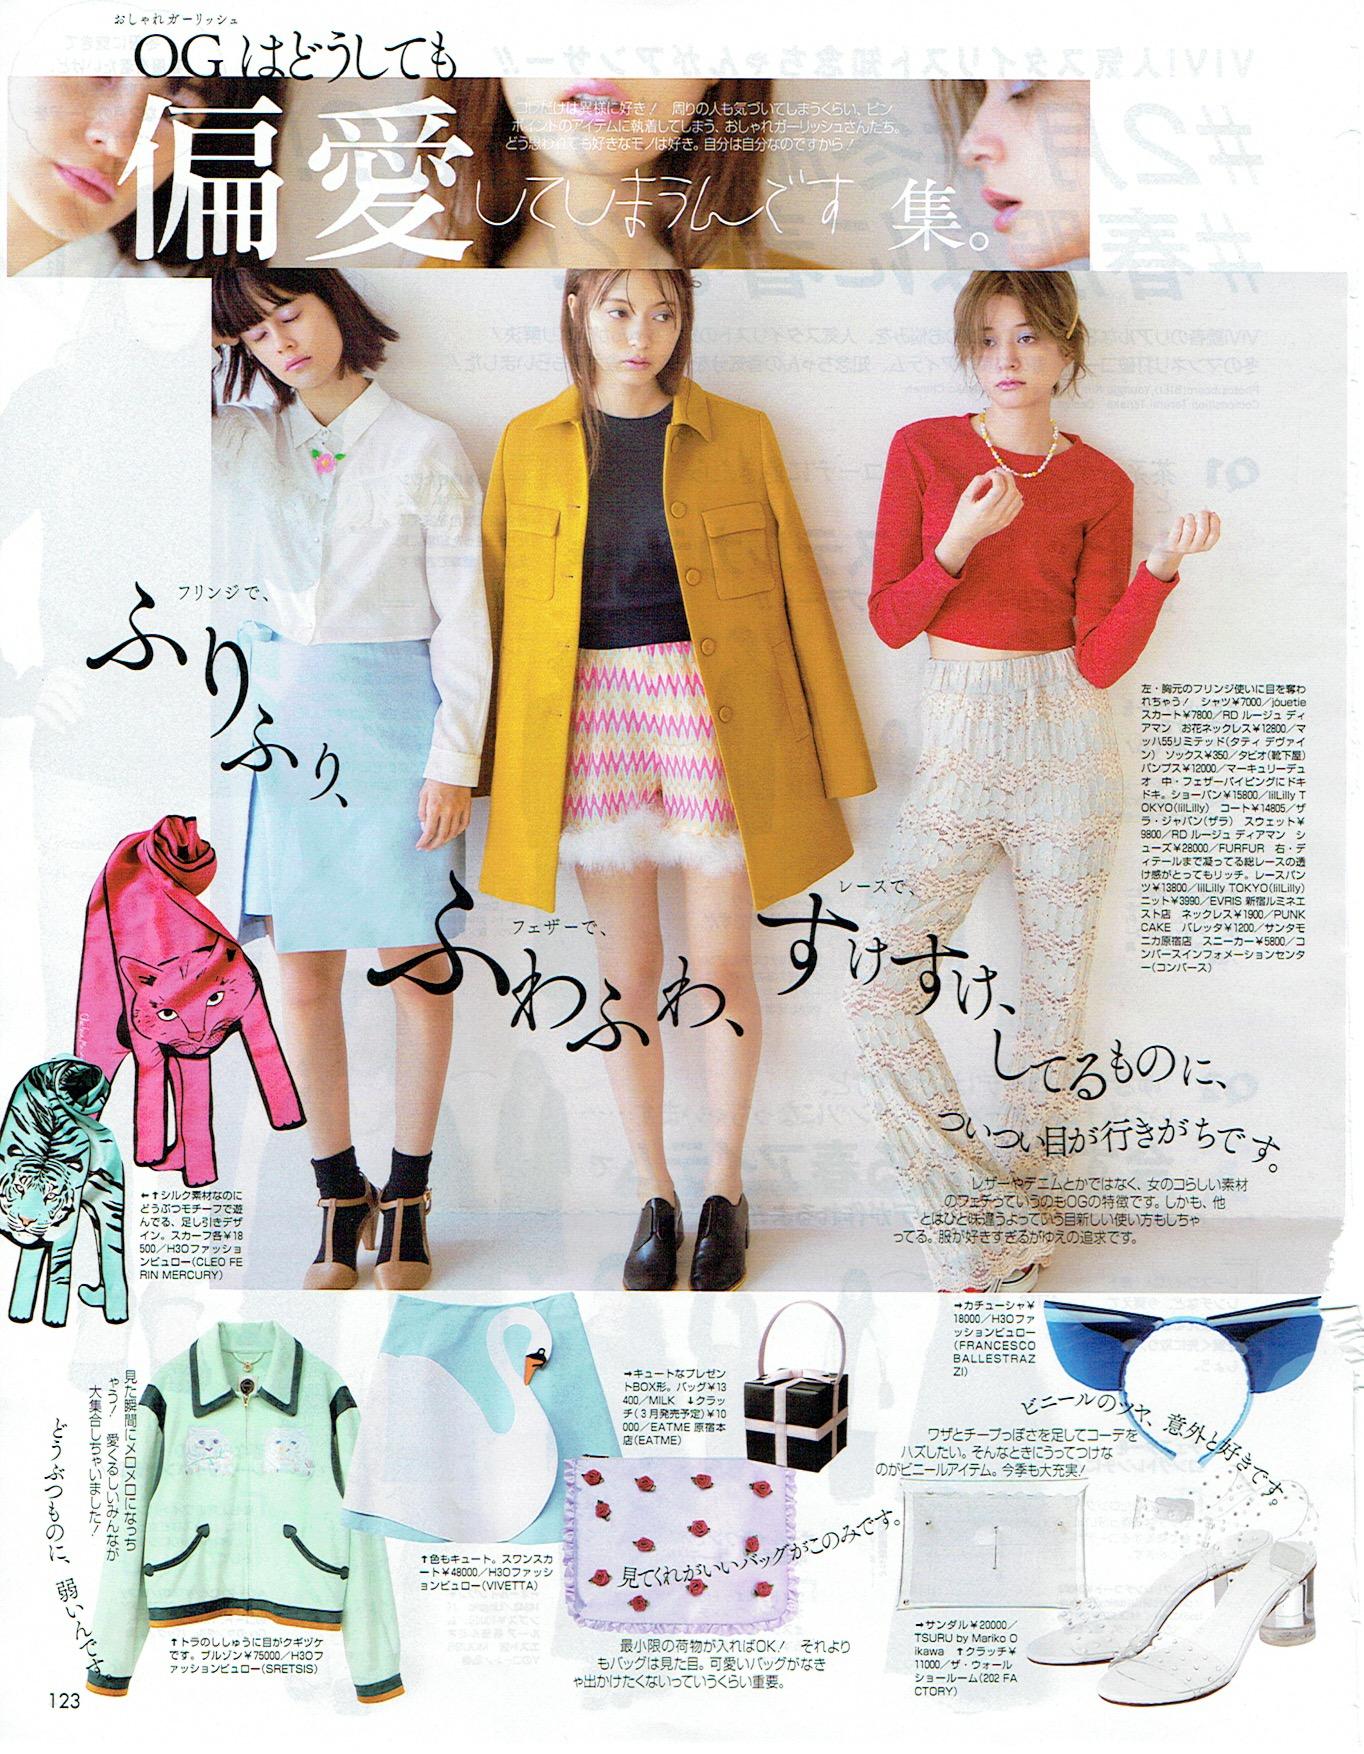 Designer Silk Scarves as seen in ViVi Magazine